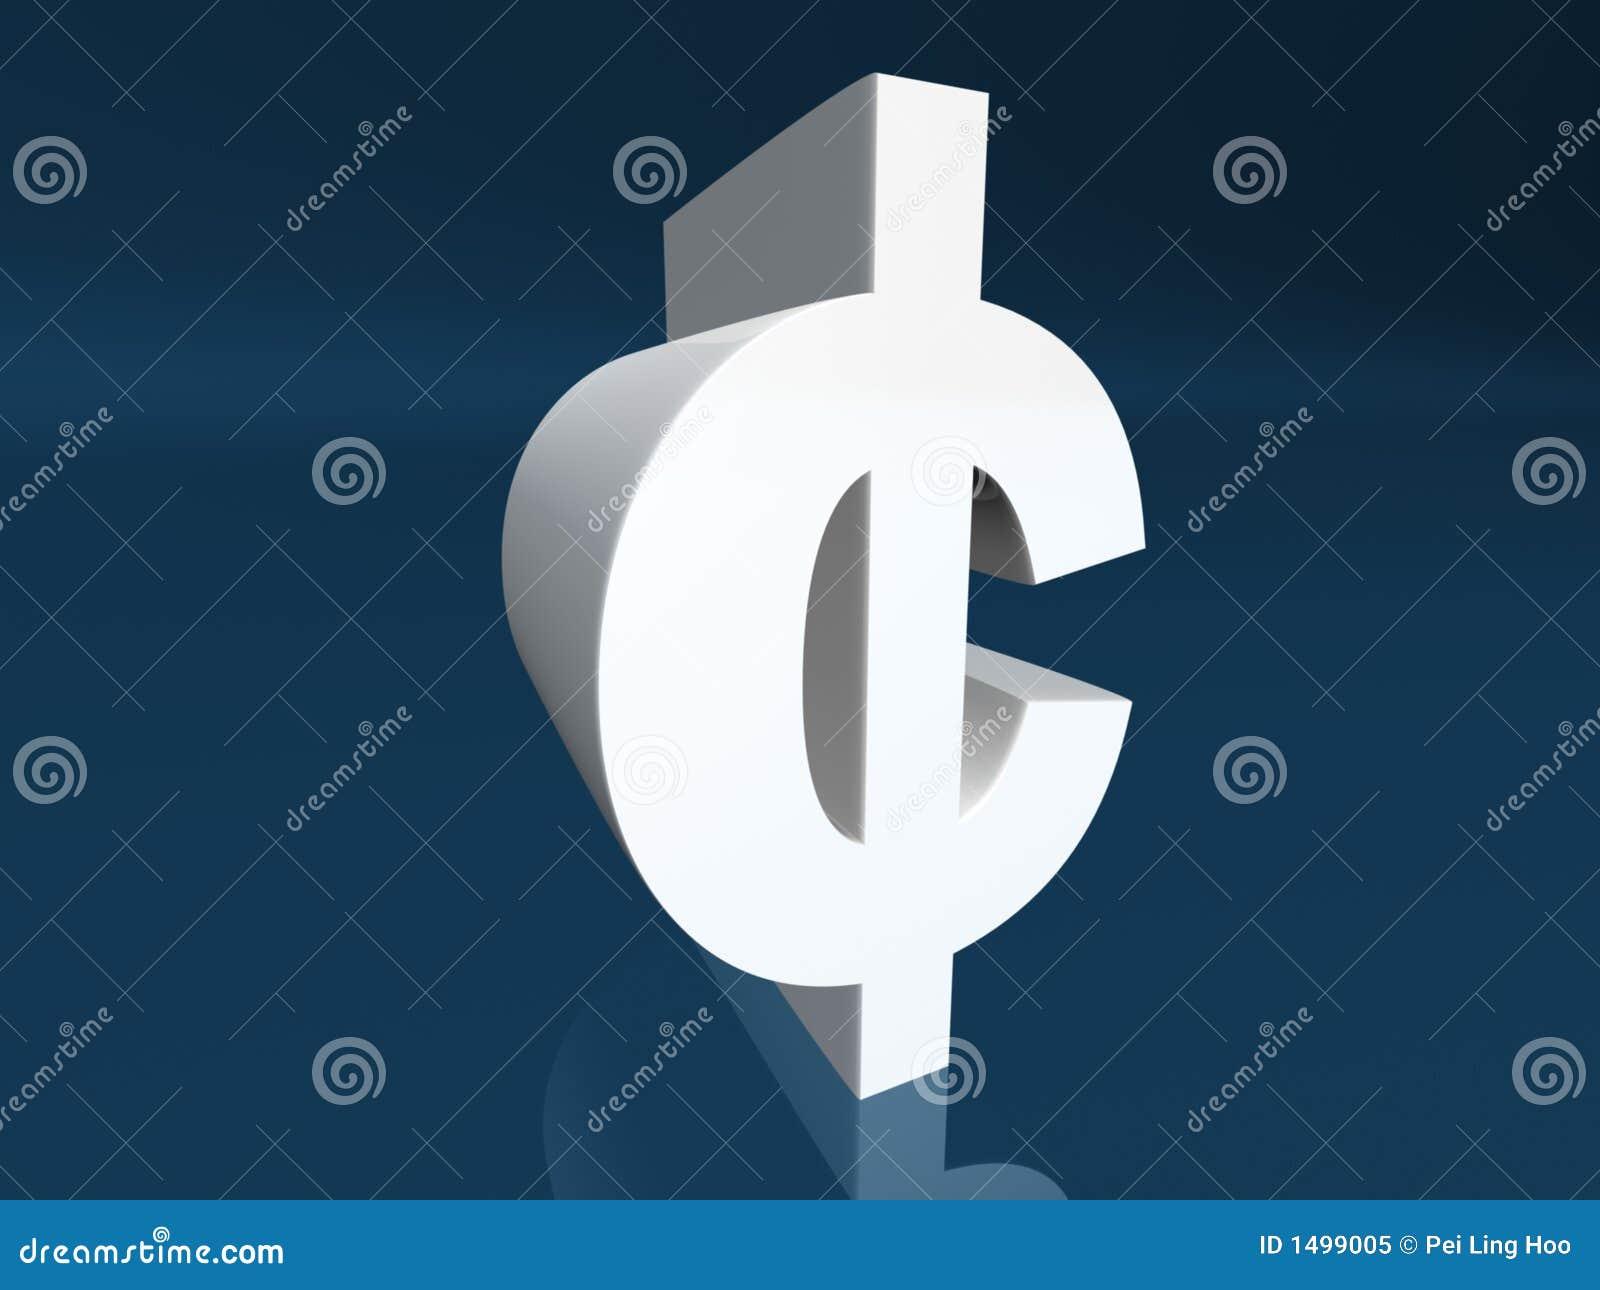 Centsymbol